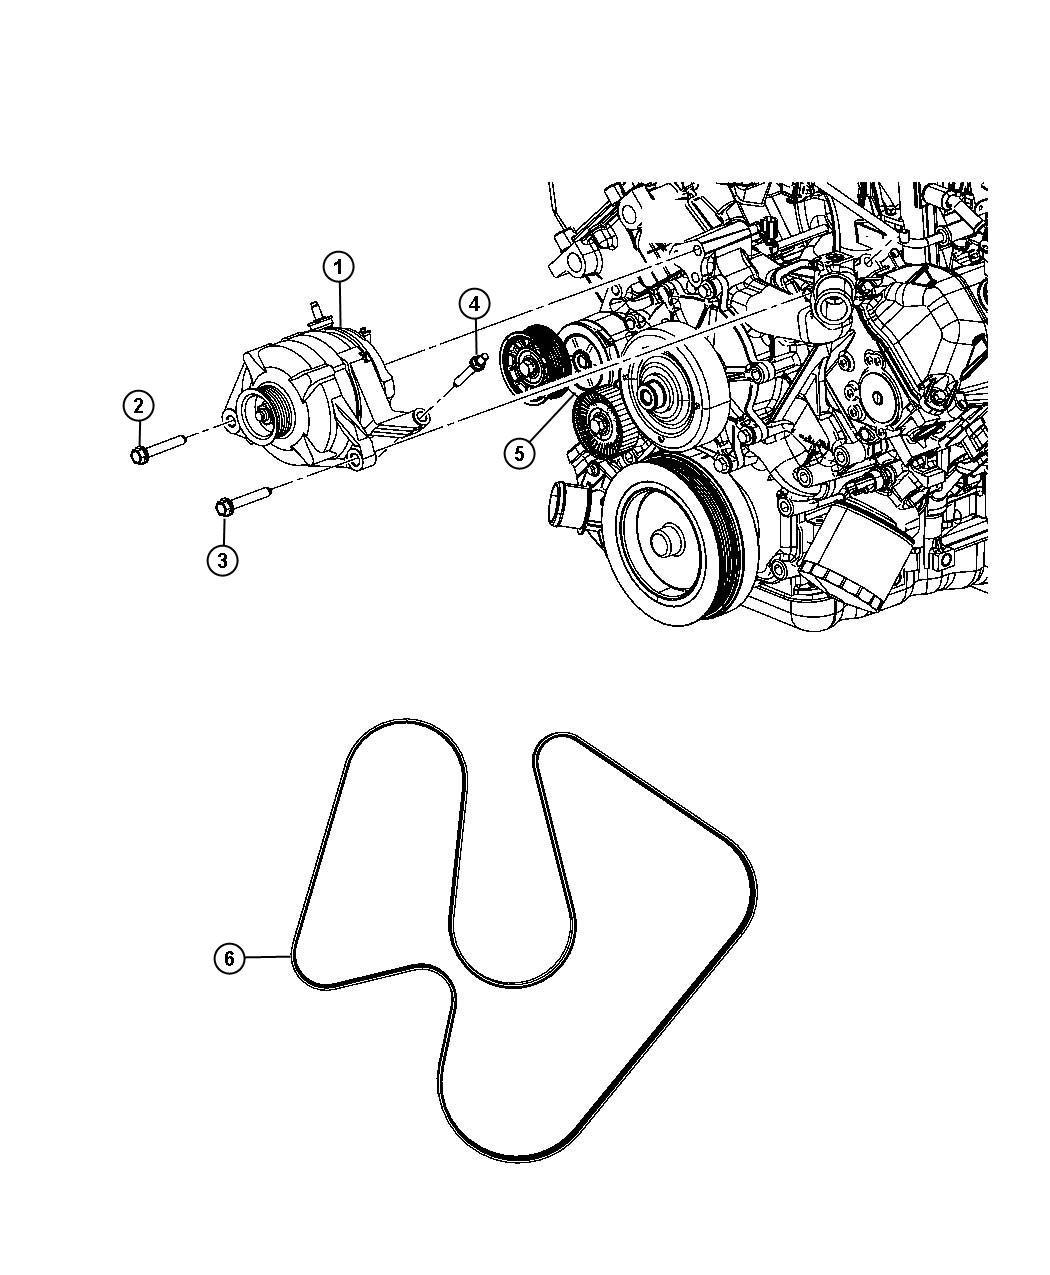 2016 Dodge Ram 1500 Generator Schematic Ram 1500 Generator Engine Remanufactured [160 and Alternator] R Al Of 2016 Dodge Ram 1500 Generator Schematic